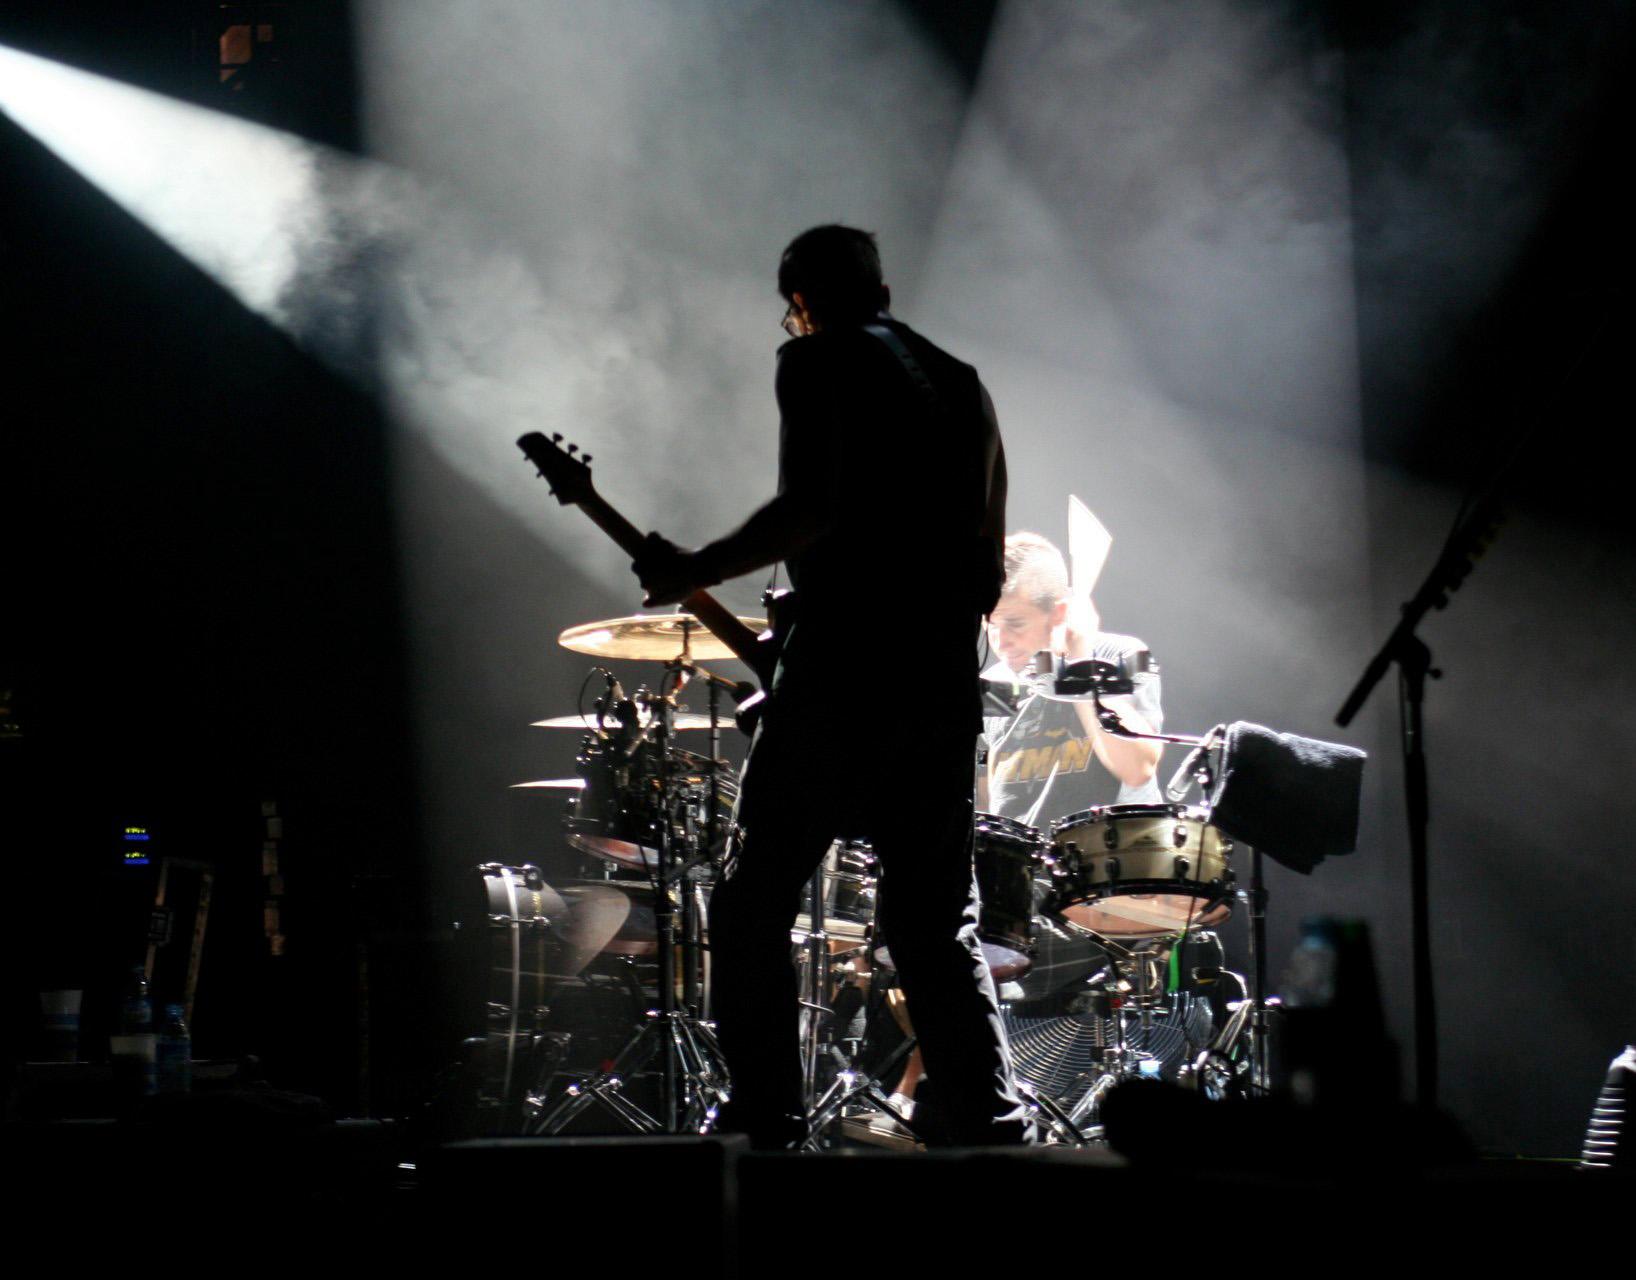 Noodles o bubeníkoch Offspringu